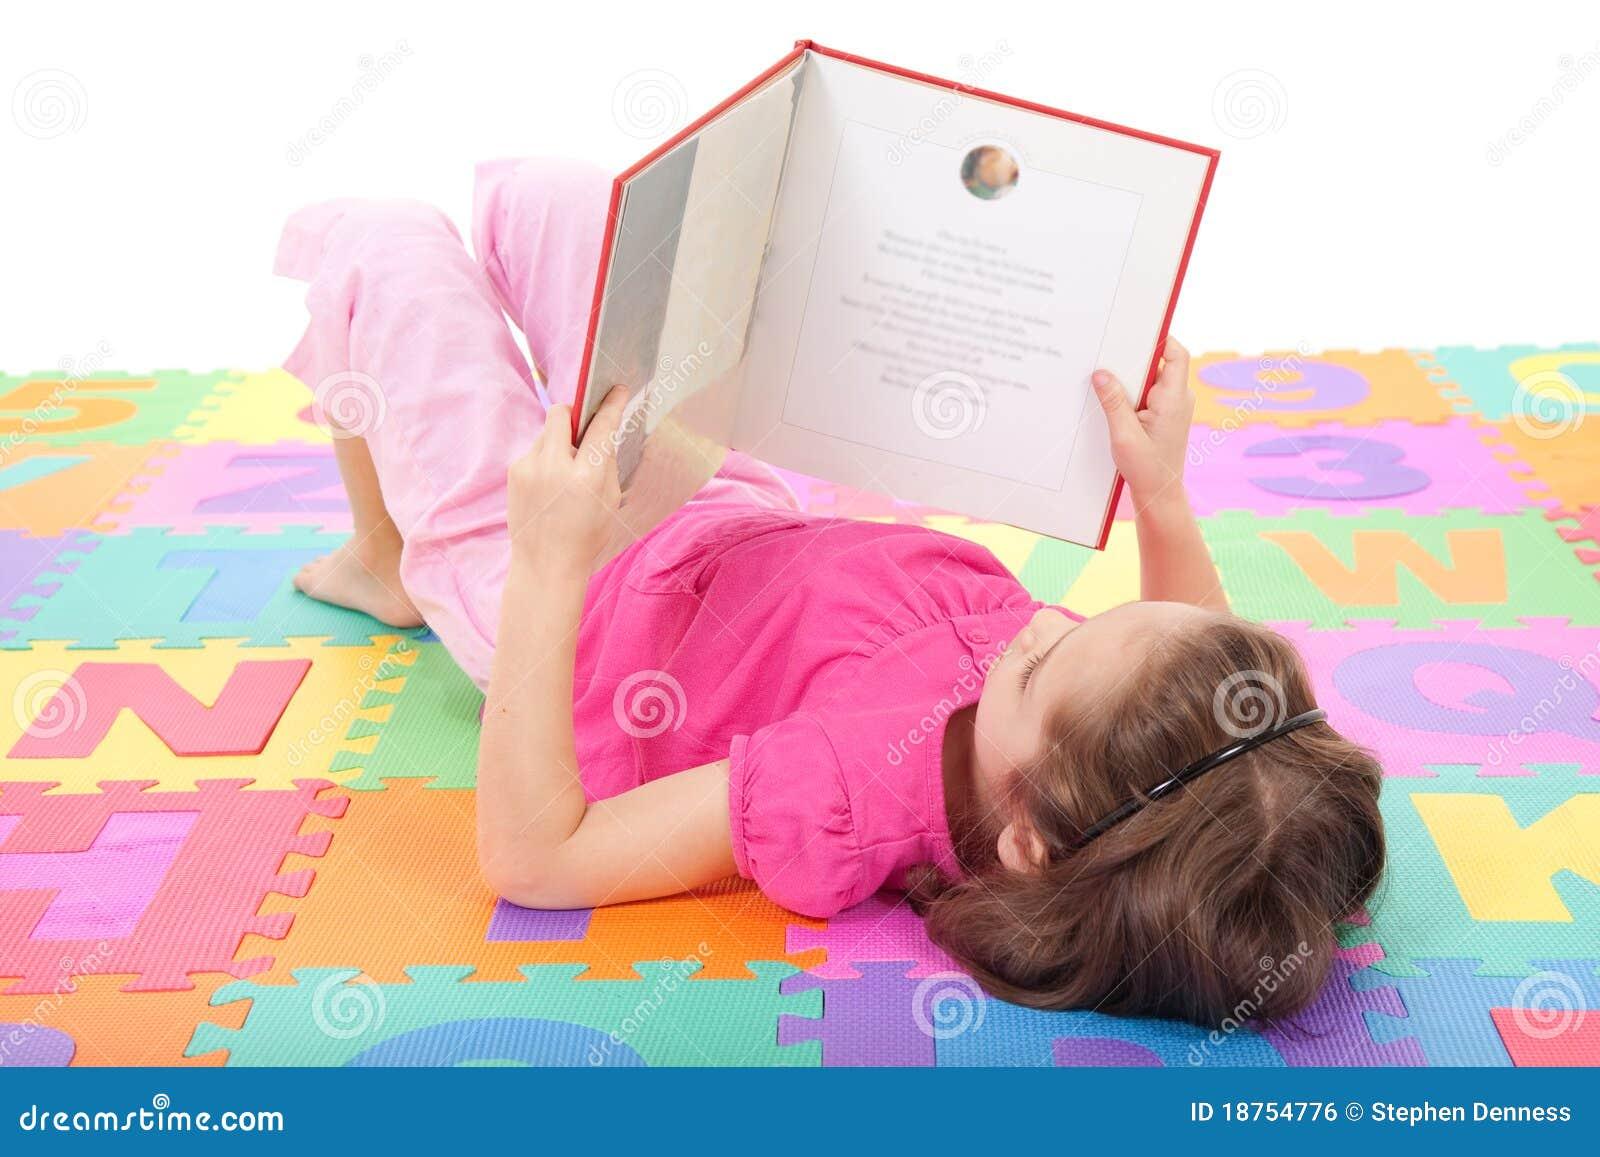 child reading kids book on alphabet royalty free stock image